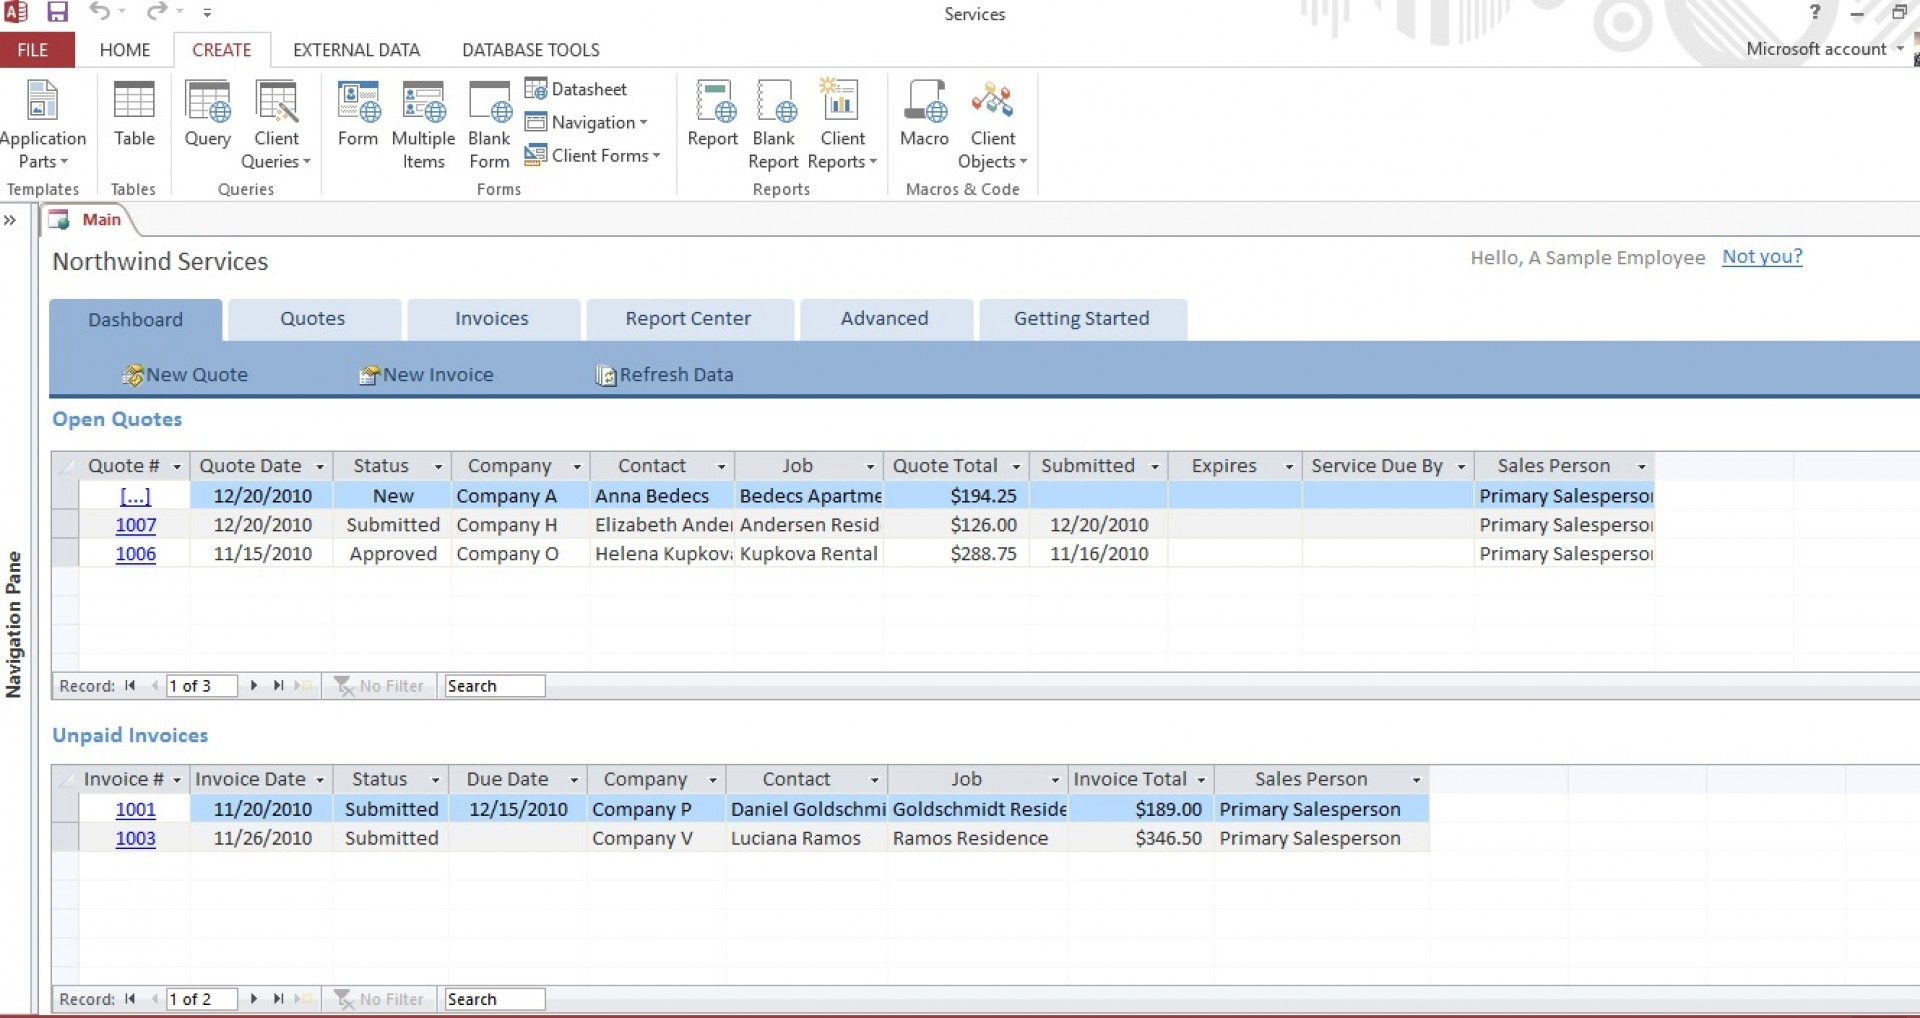 003 Stupendou Acces Template For Small Busines Idea  Business M Free Microsoft Download1920